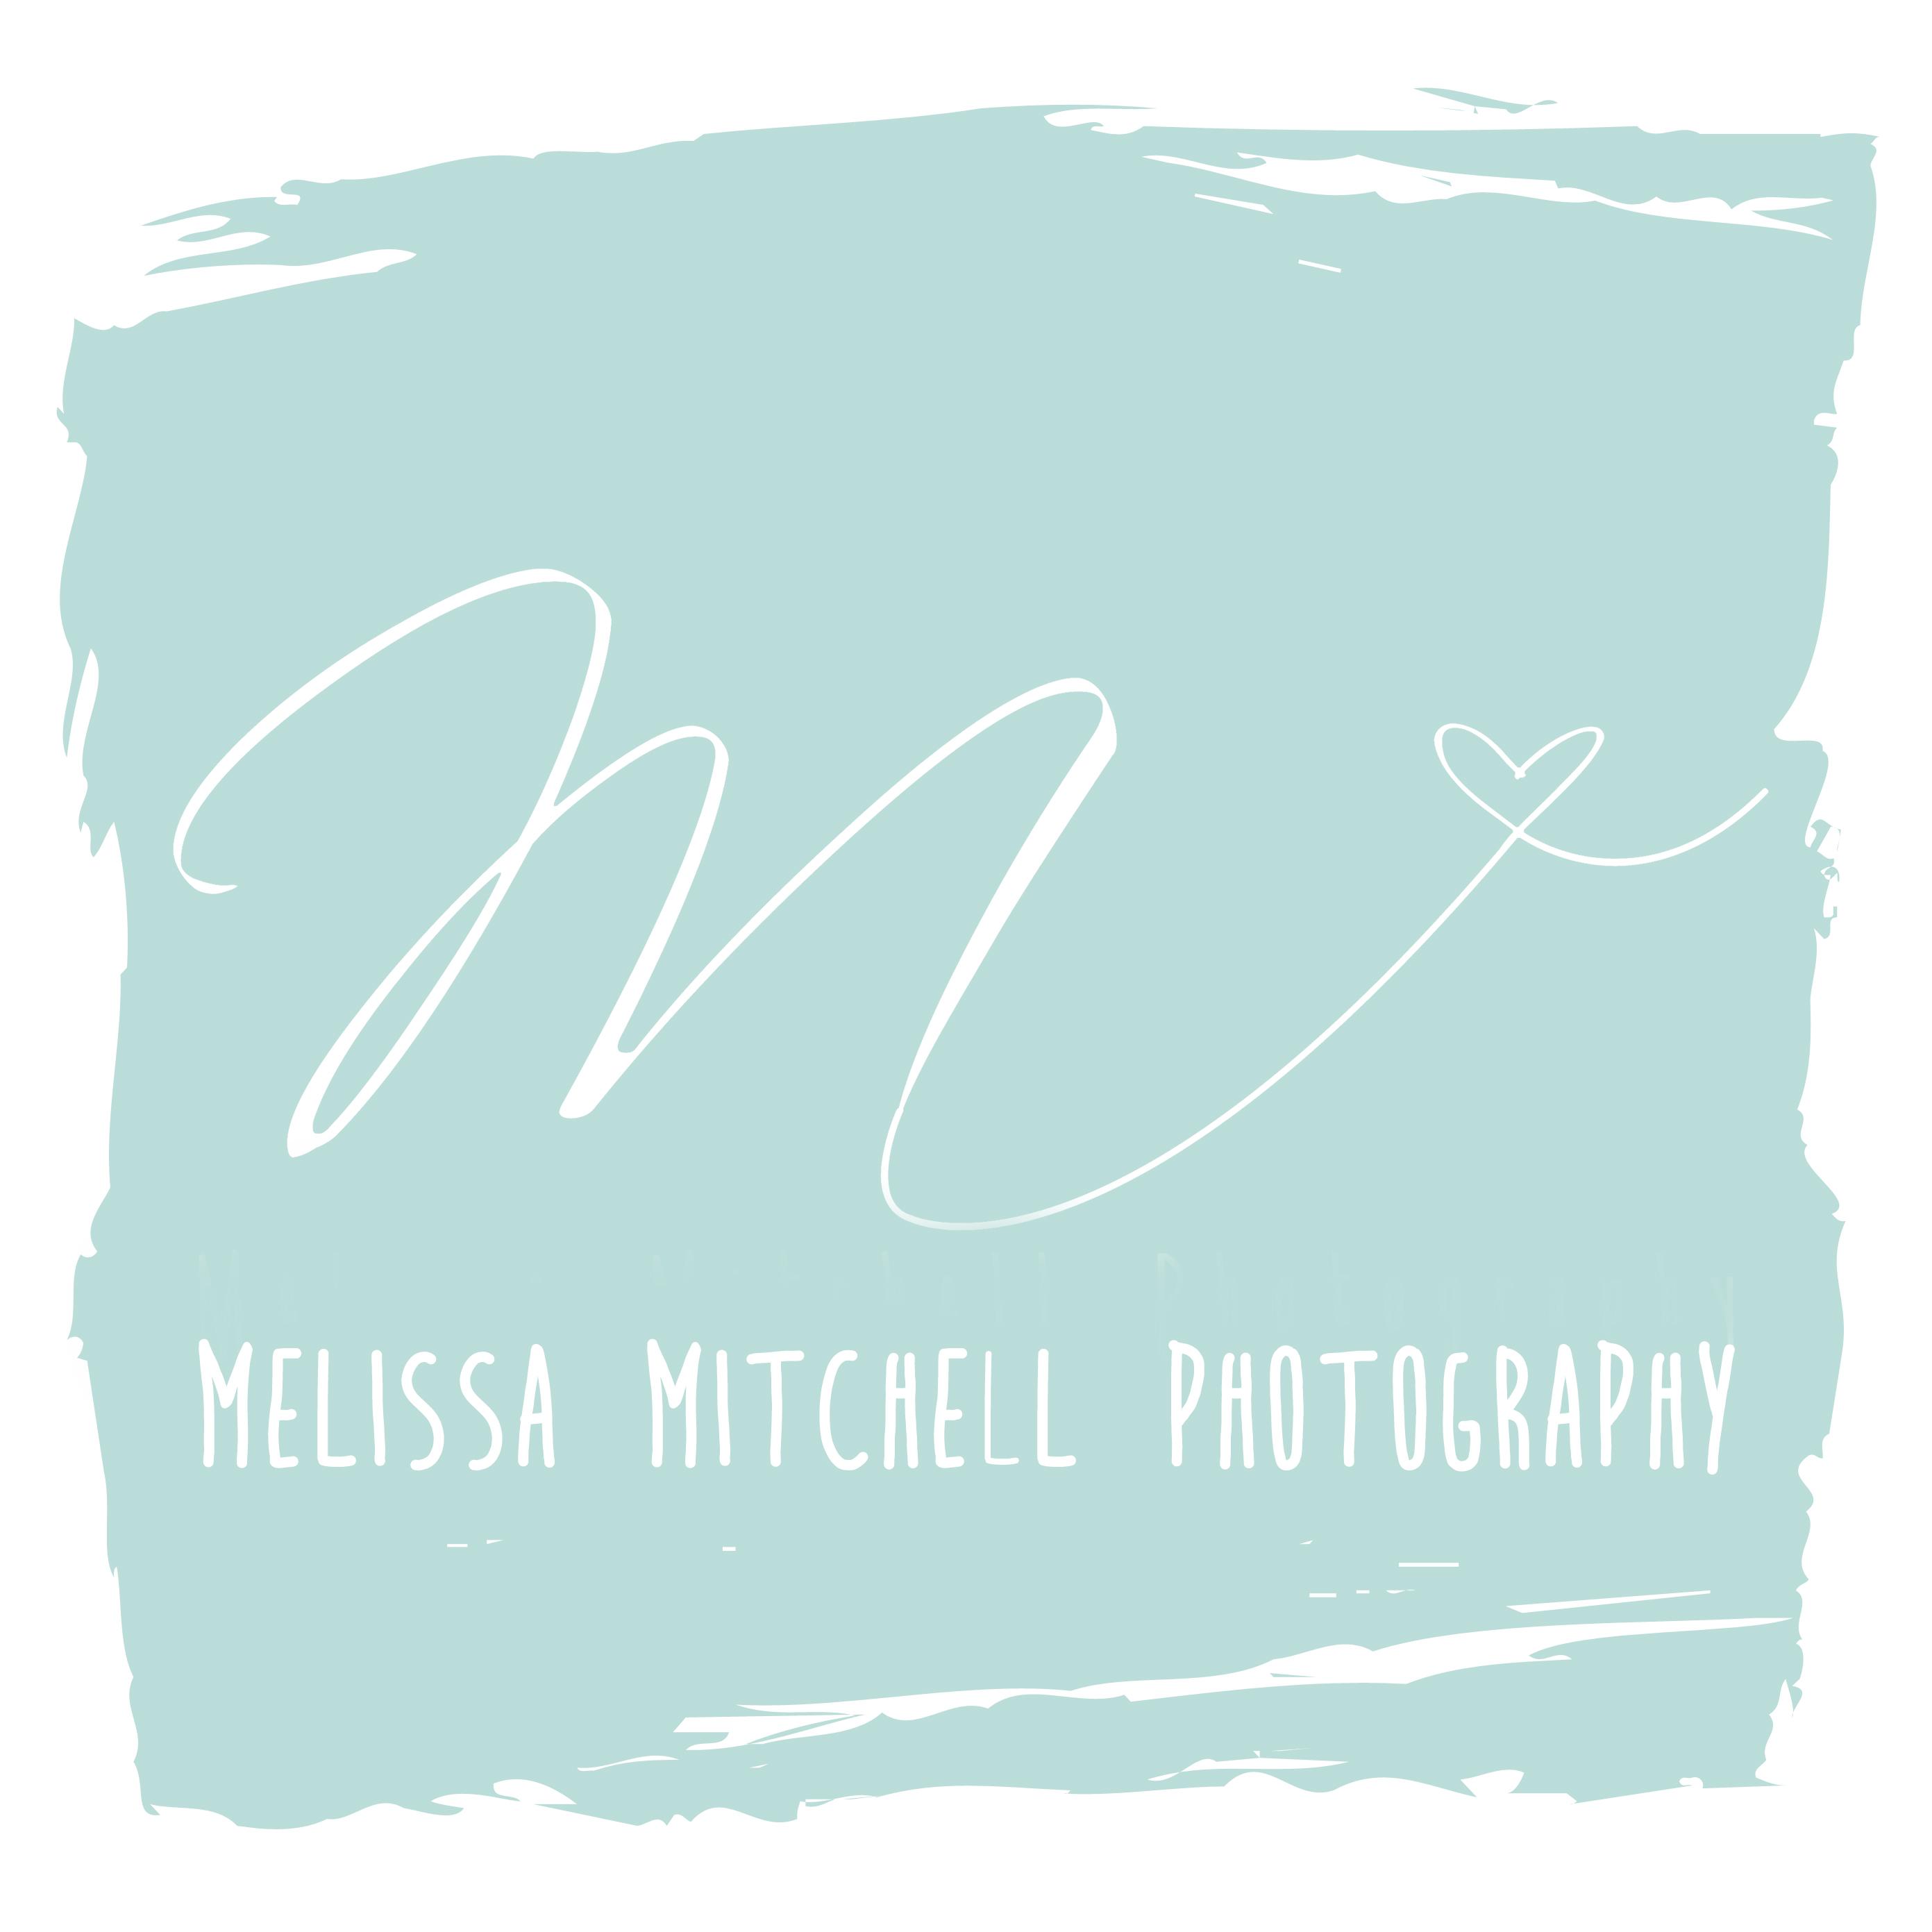 Melissa mitchell Logo